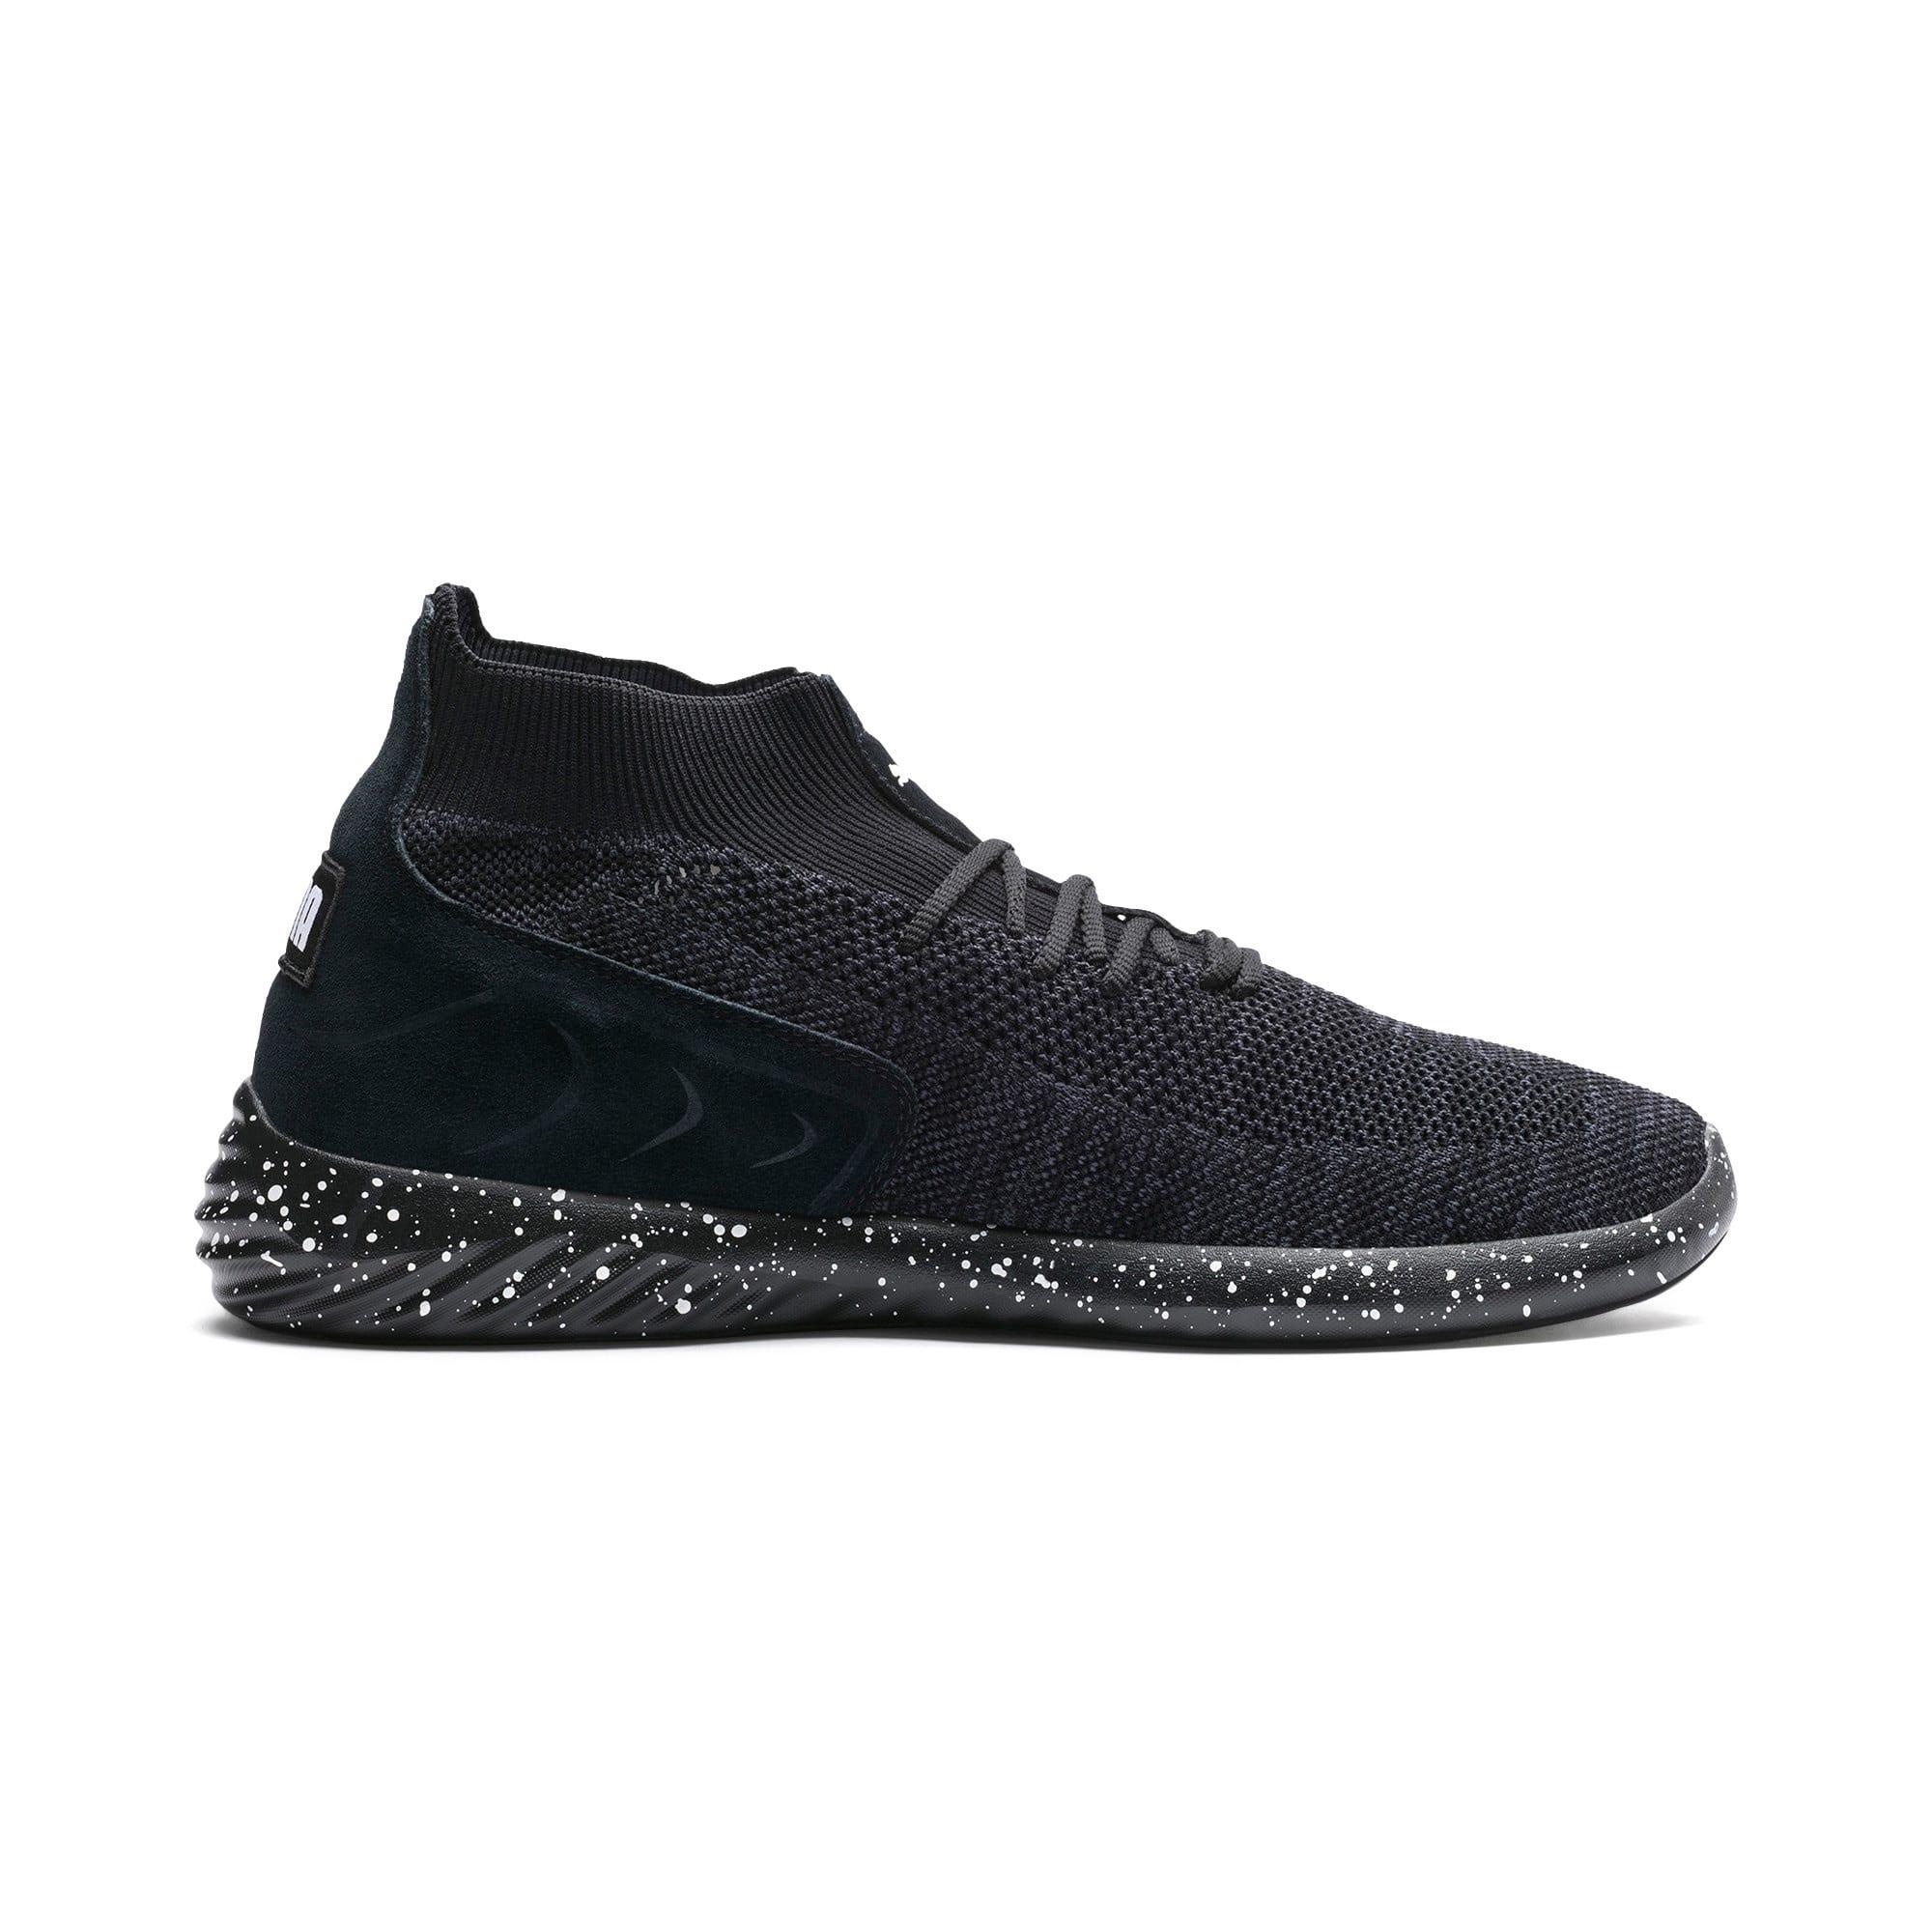 Thumbnail 5 of Speed Cat Wings Monaco Shoes, PumaBlack-PumaWhite-Black, medium